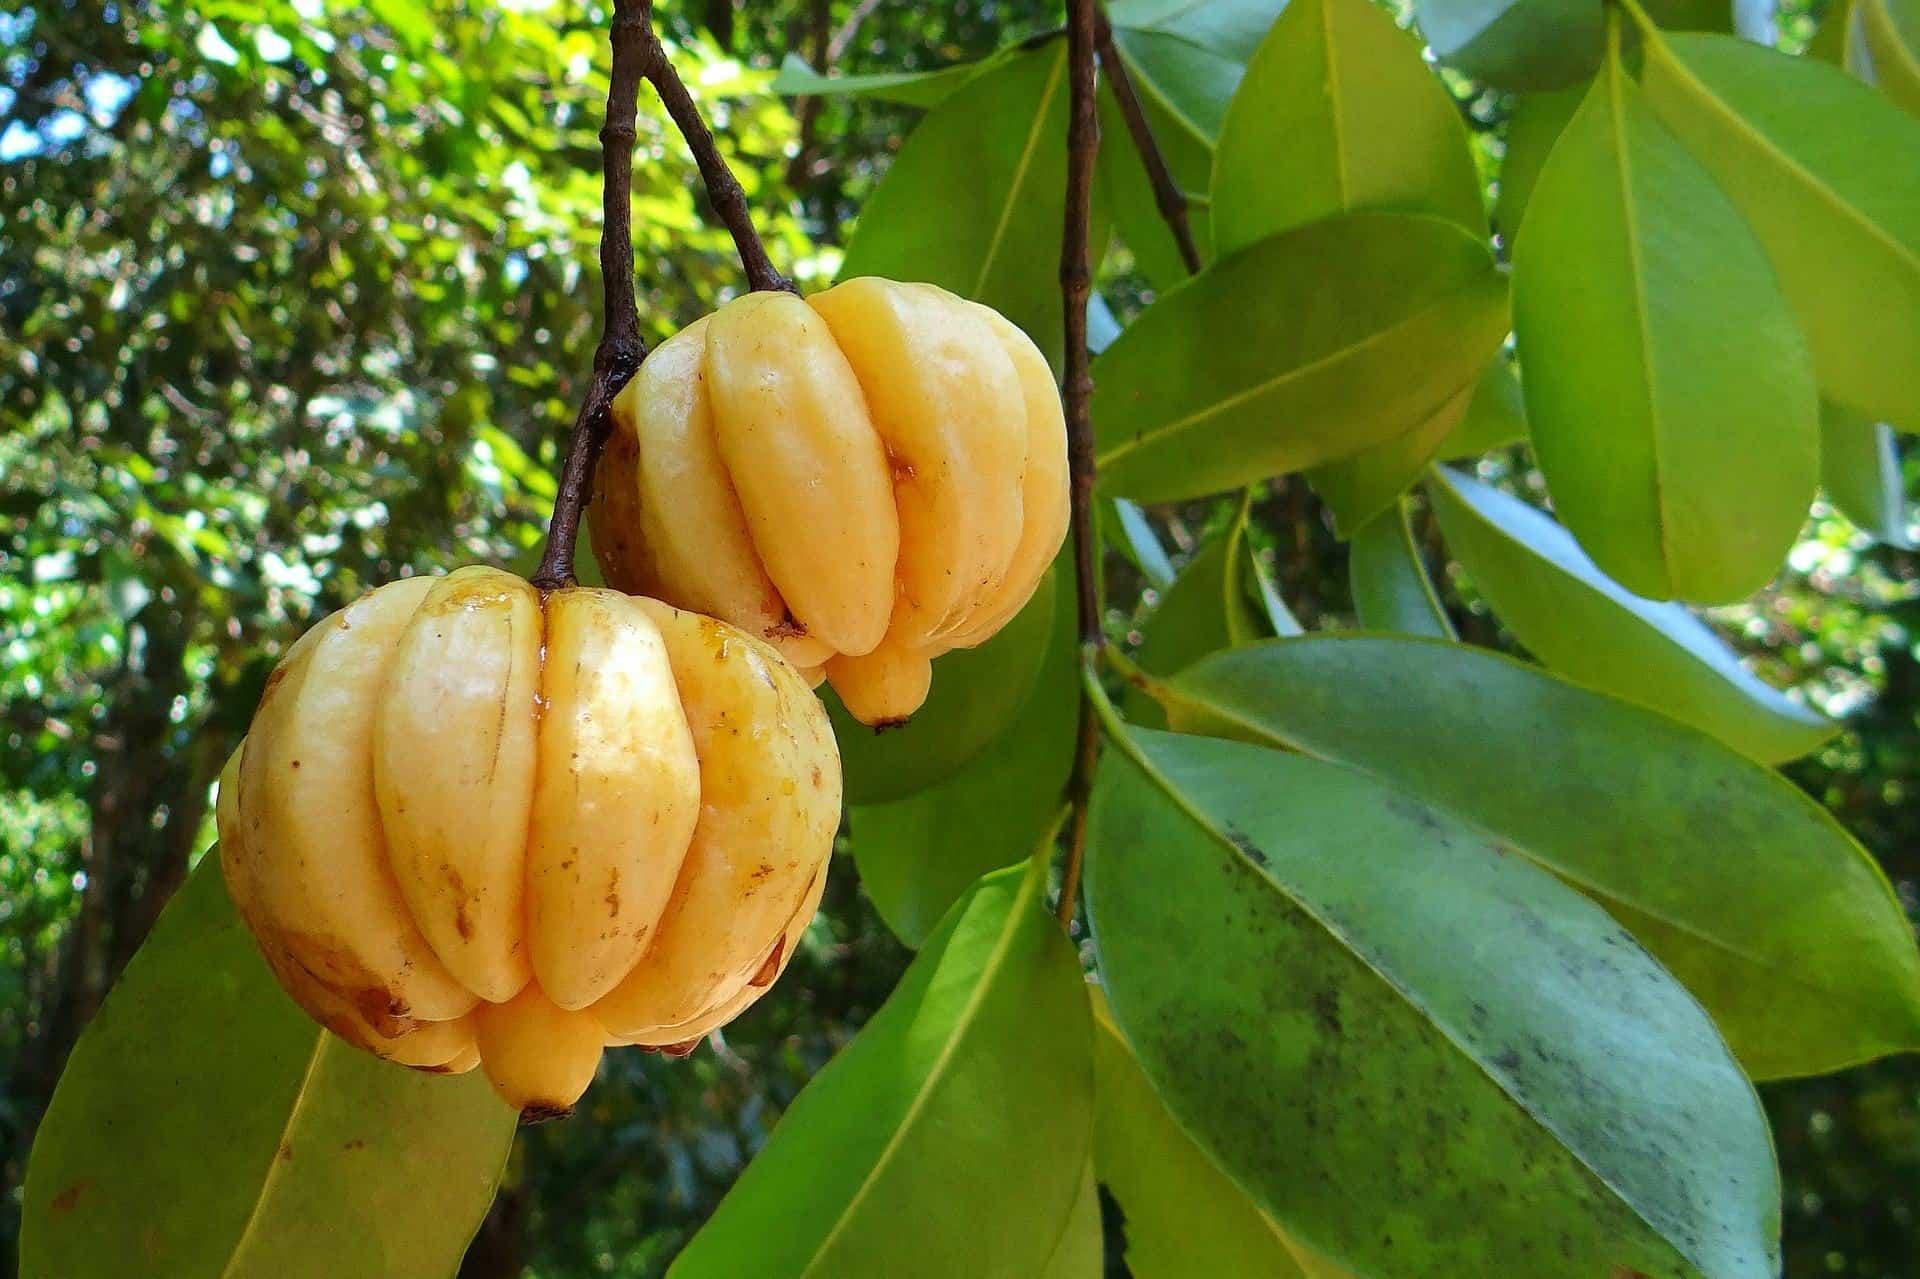 La Garcinia Cambogia è utile per dimagrire?